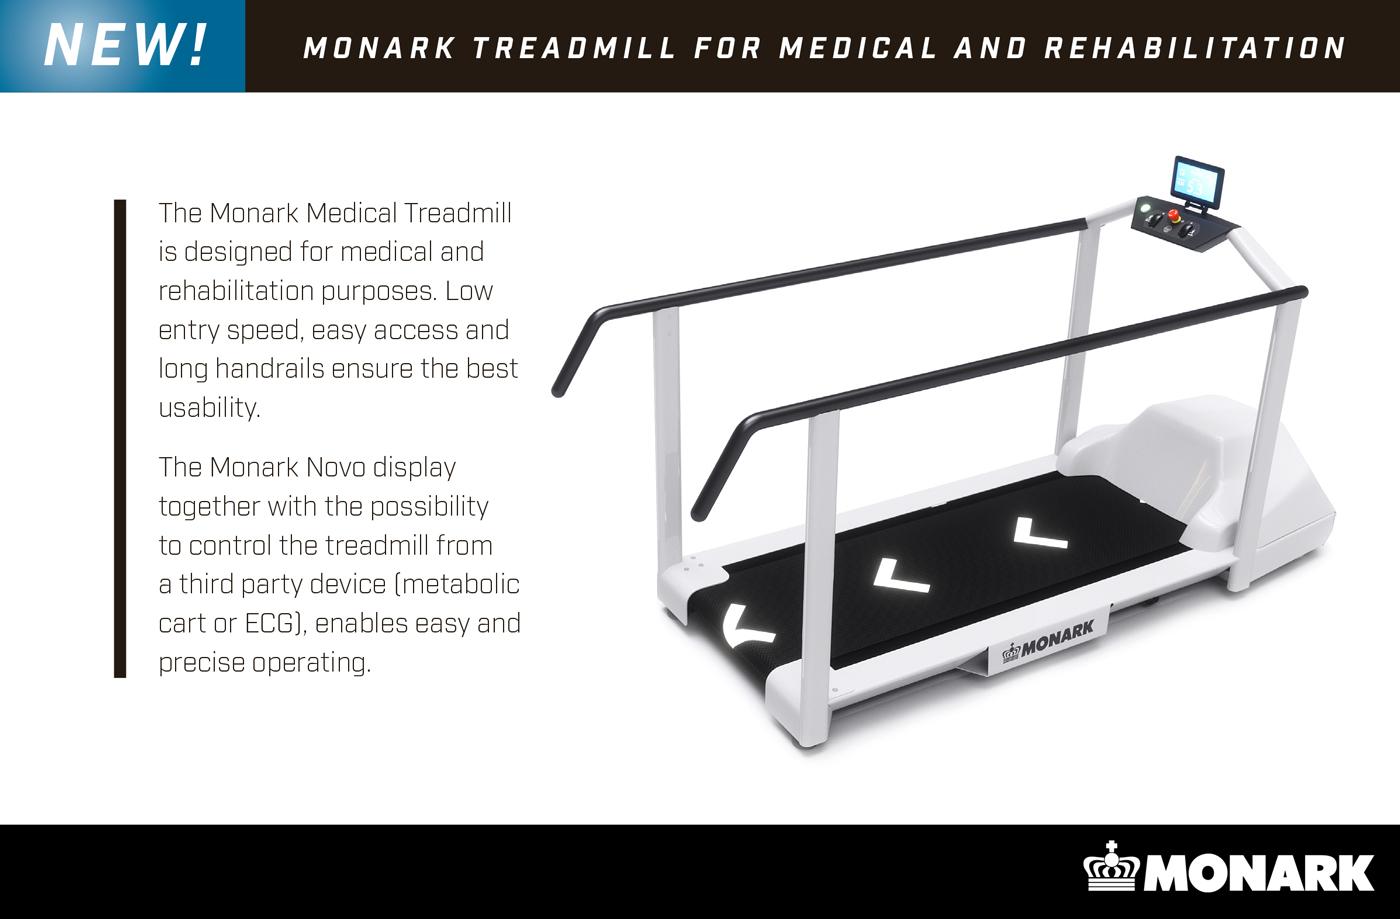 Monark_treadmill_email